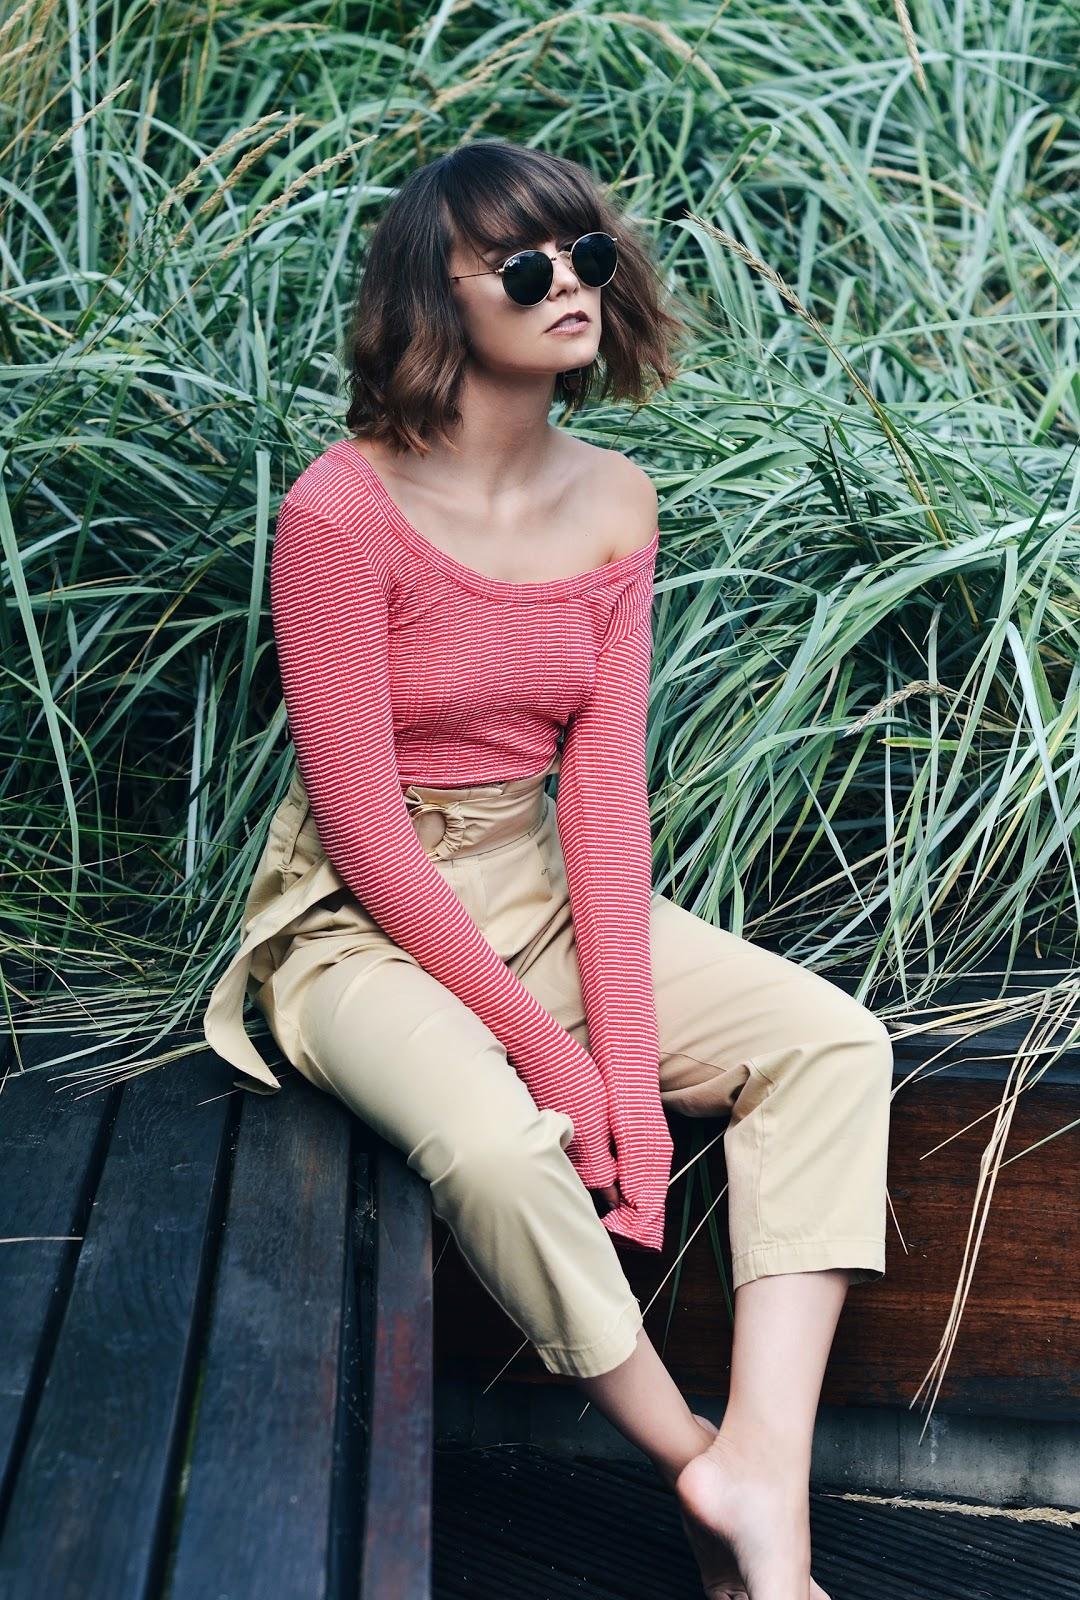 okulary ray ban |spodnie zara